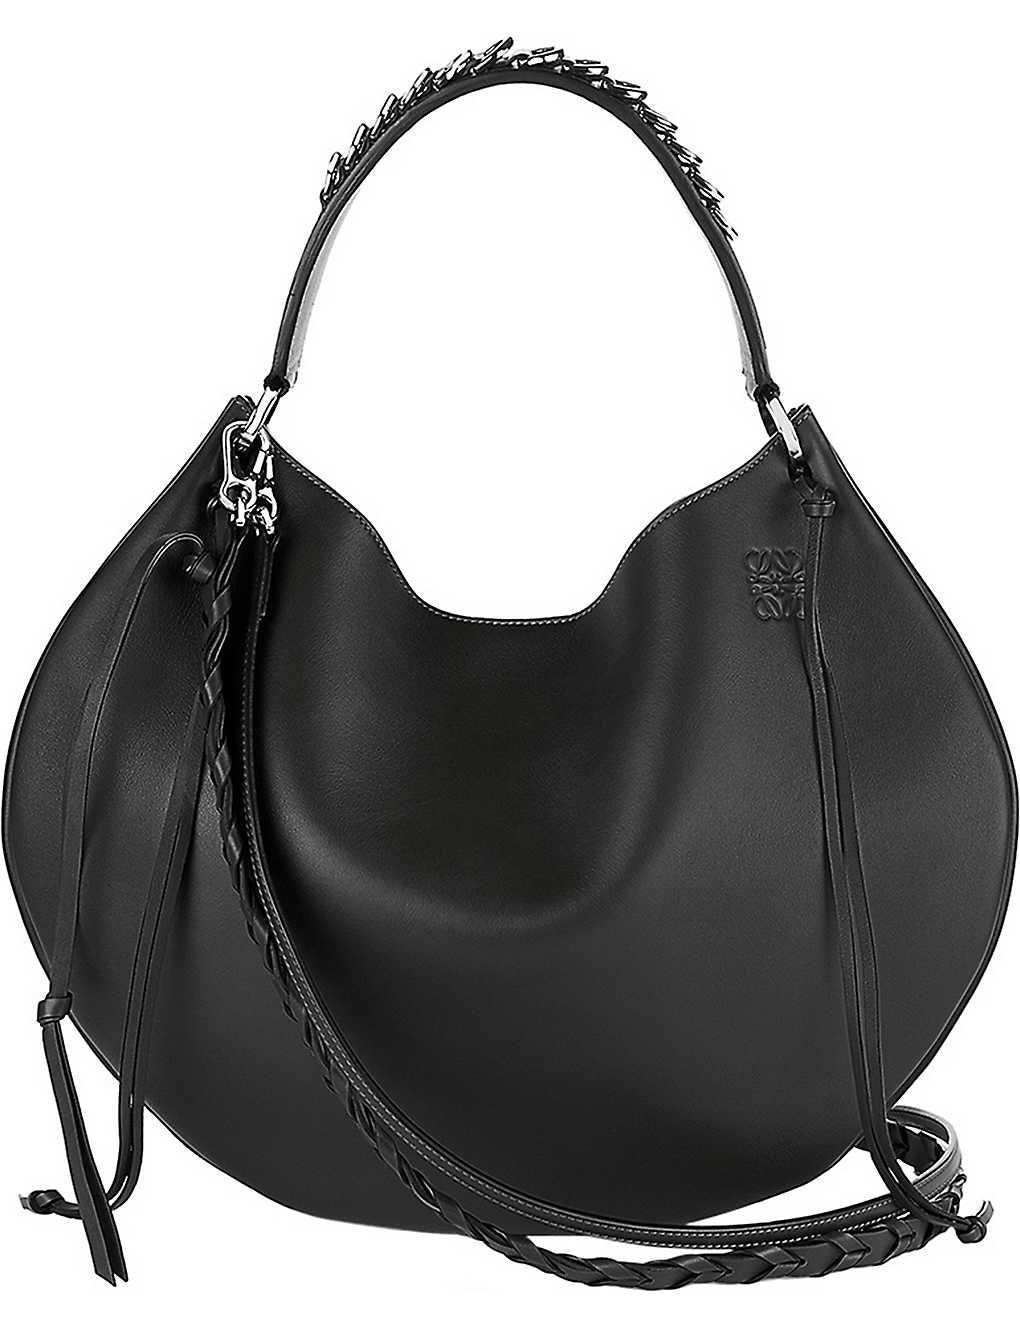 LOEWE - Fortune slouchy leather shoulder bag | Selfridges.com